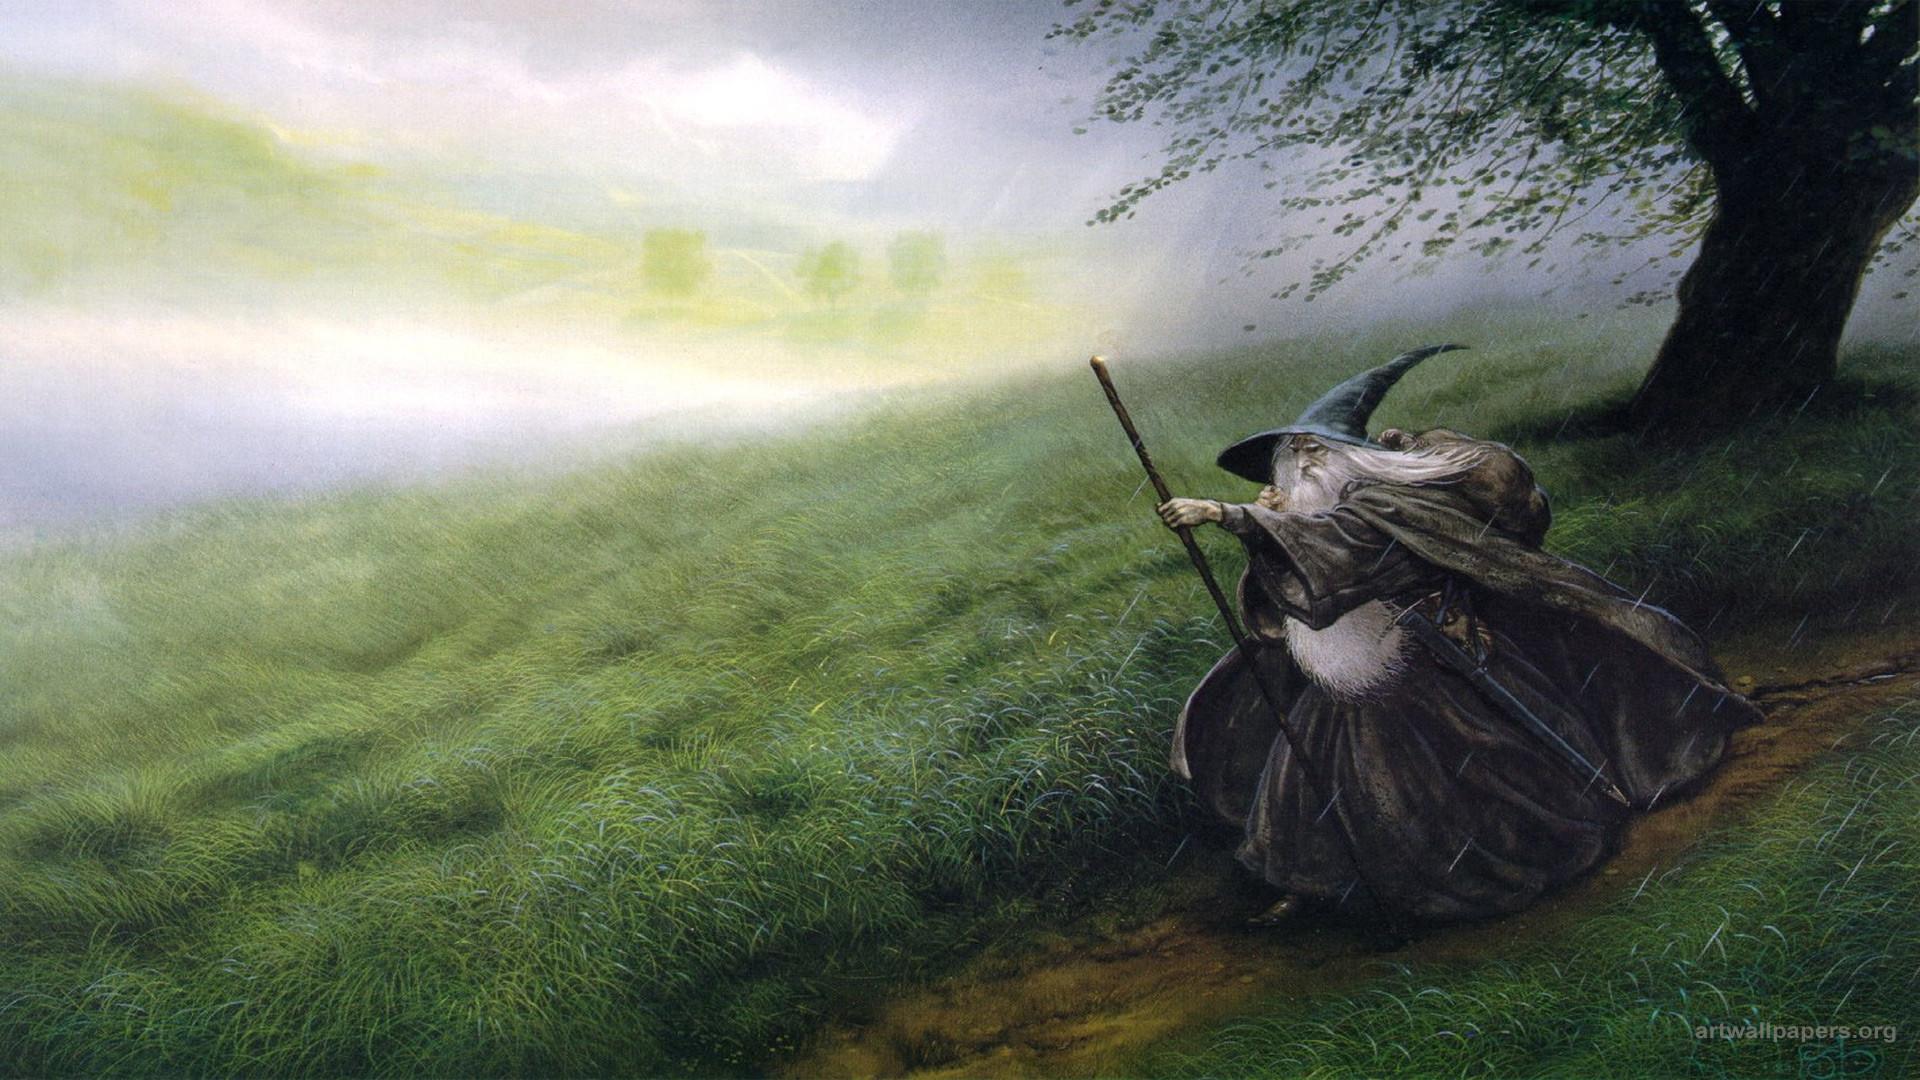 Res: 1920x1080, ... x 1200. JRR Tolkien Photo